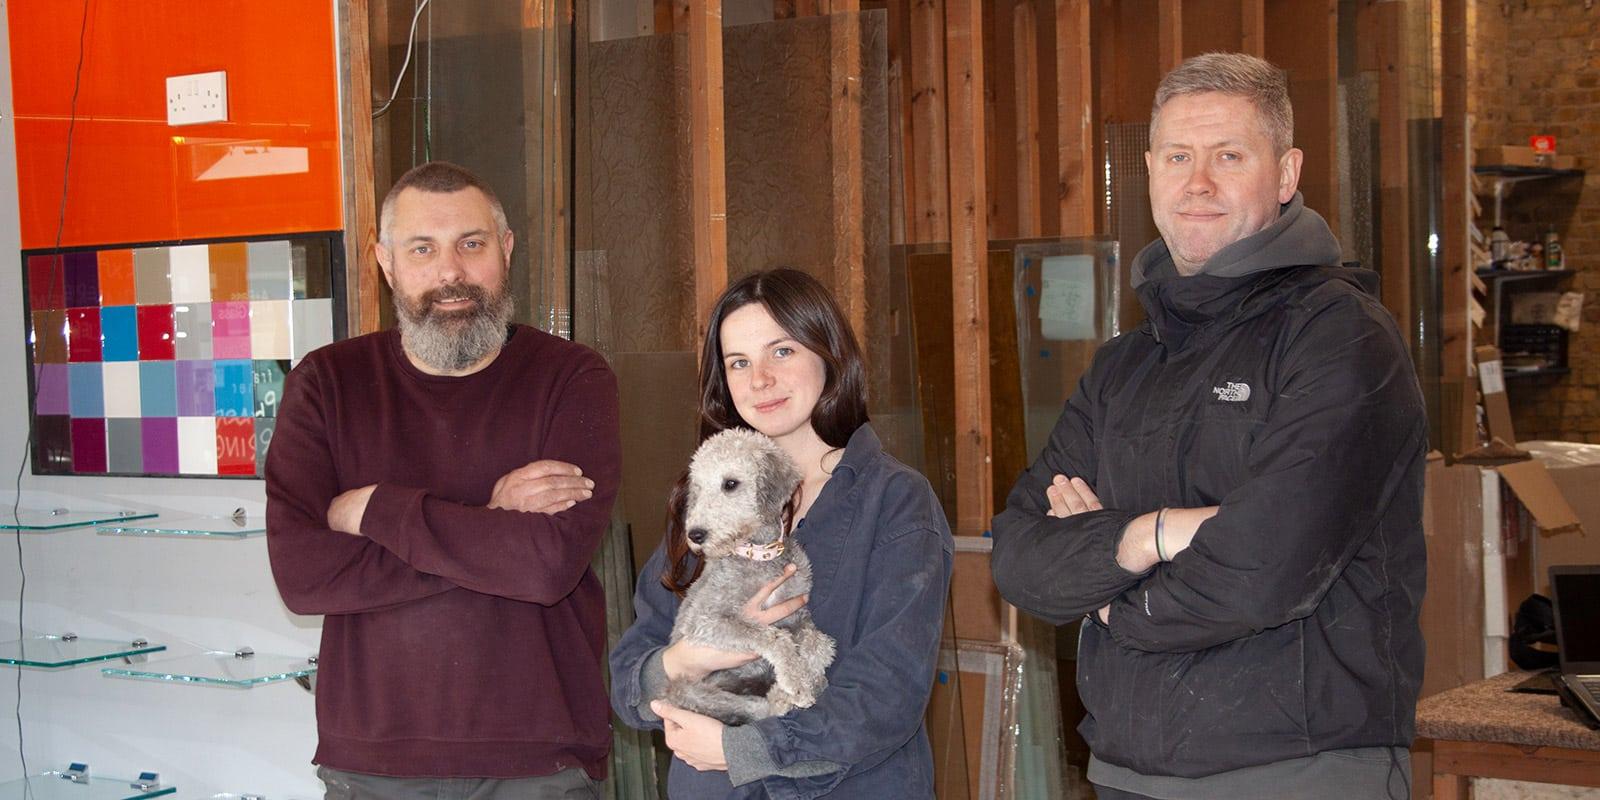 Our Stoke Newington glazing team